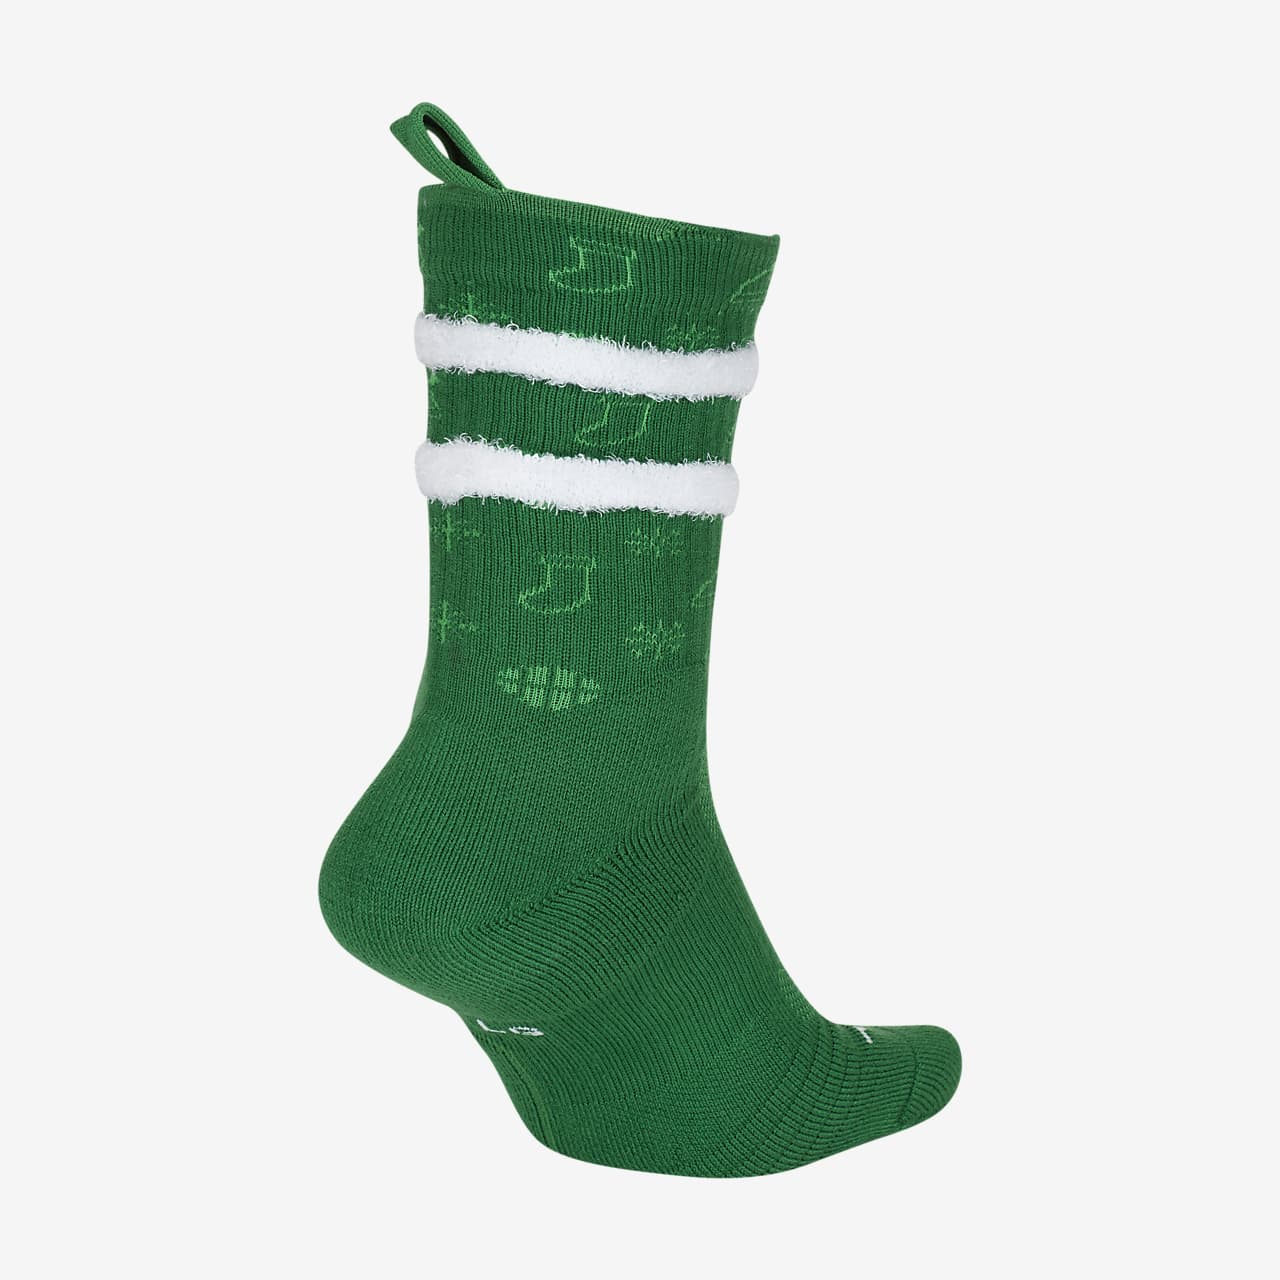 Nike Elite Crew 'Xmas' Basketball Socks